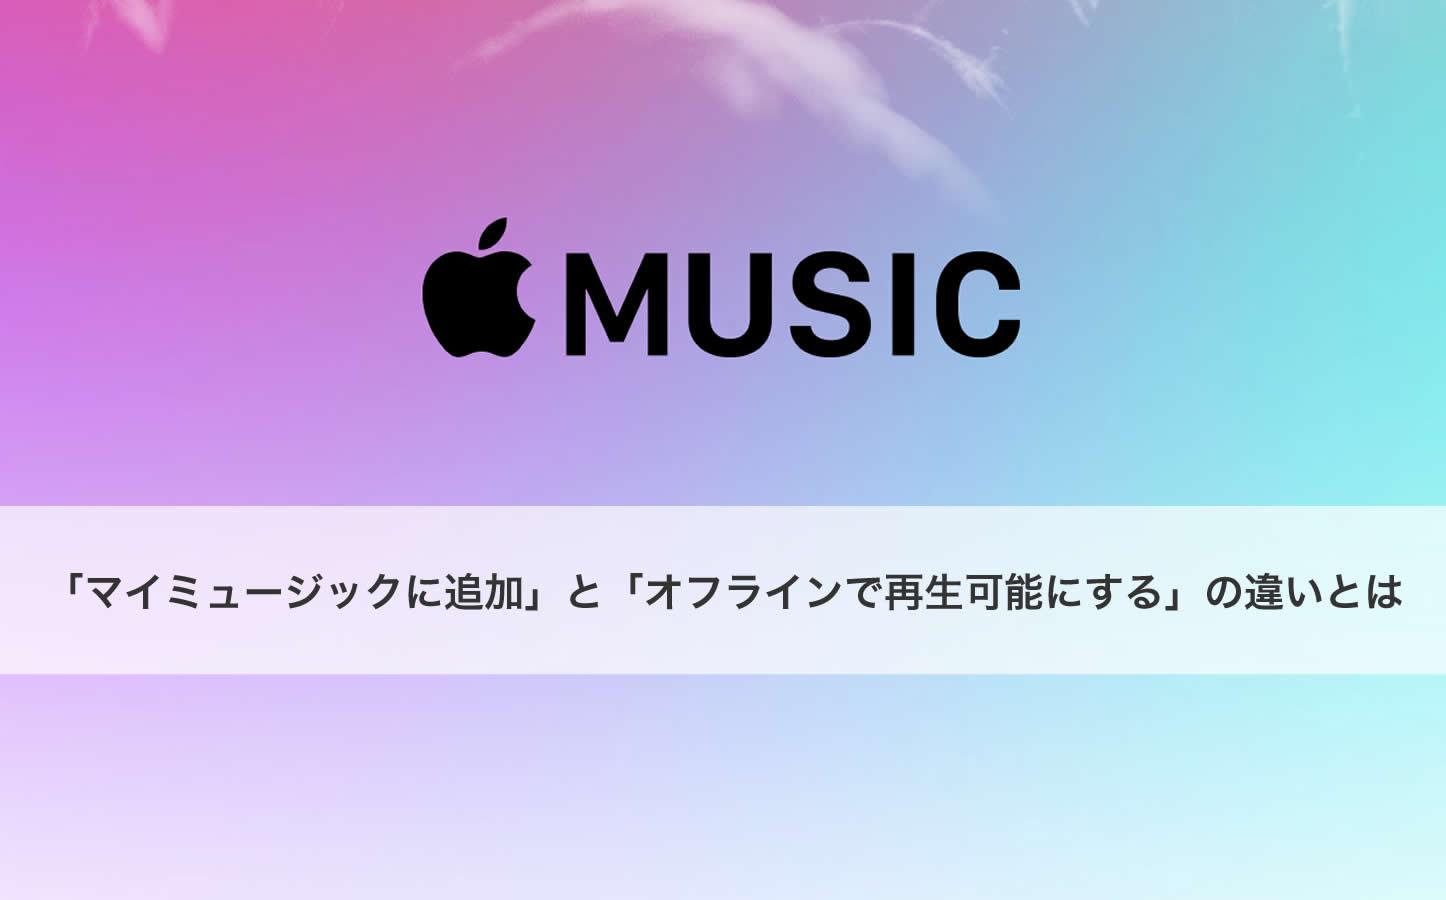 Apple Music マイミュージックに追加